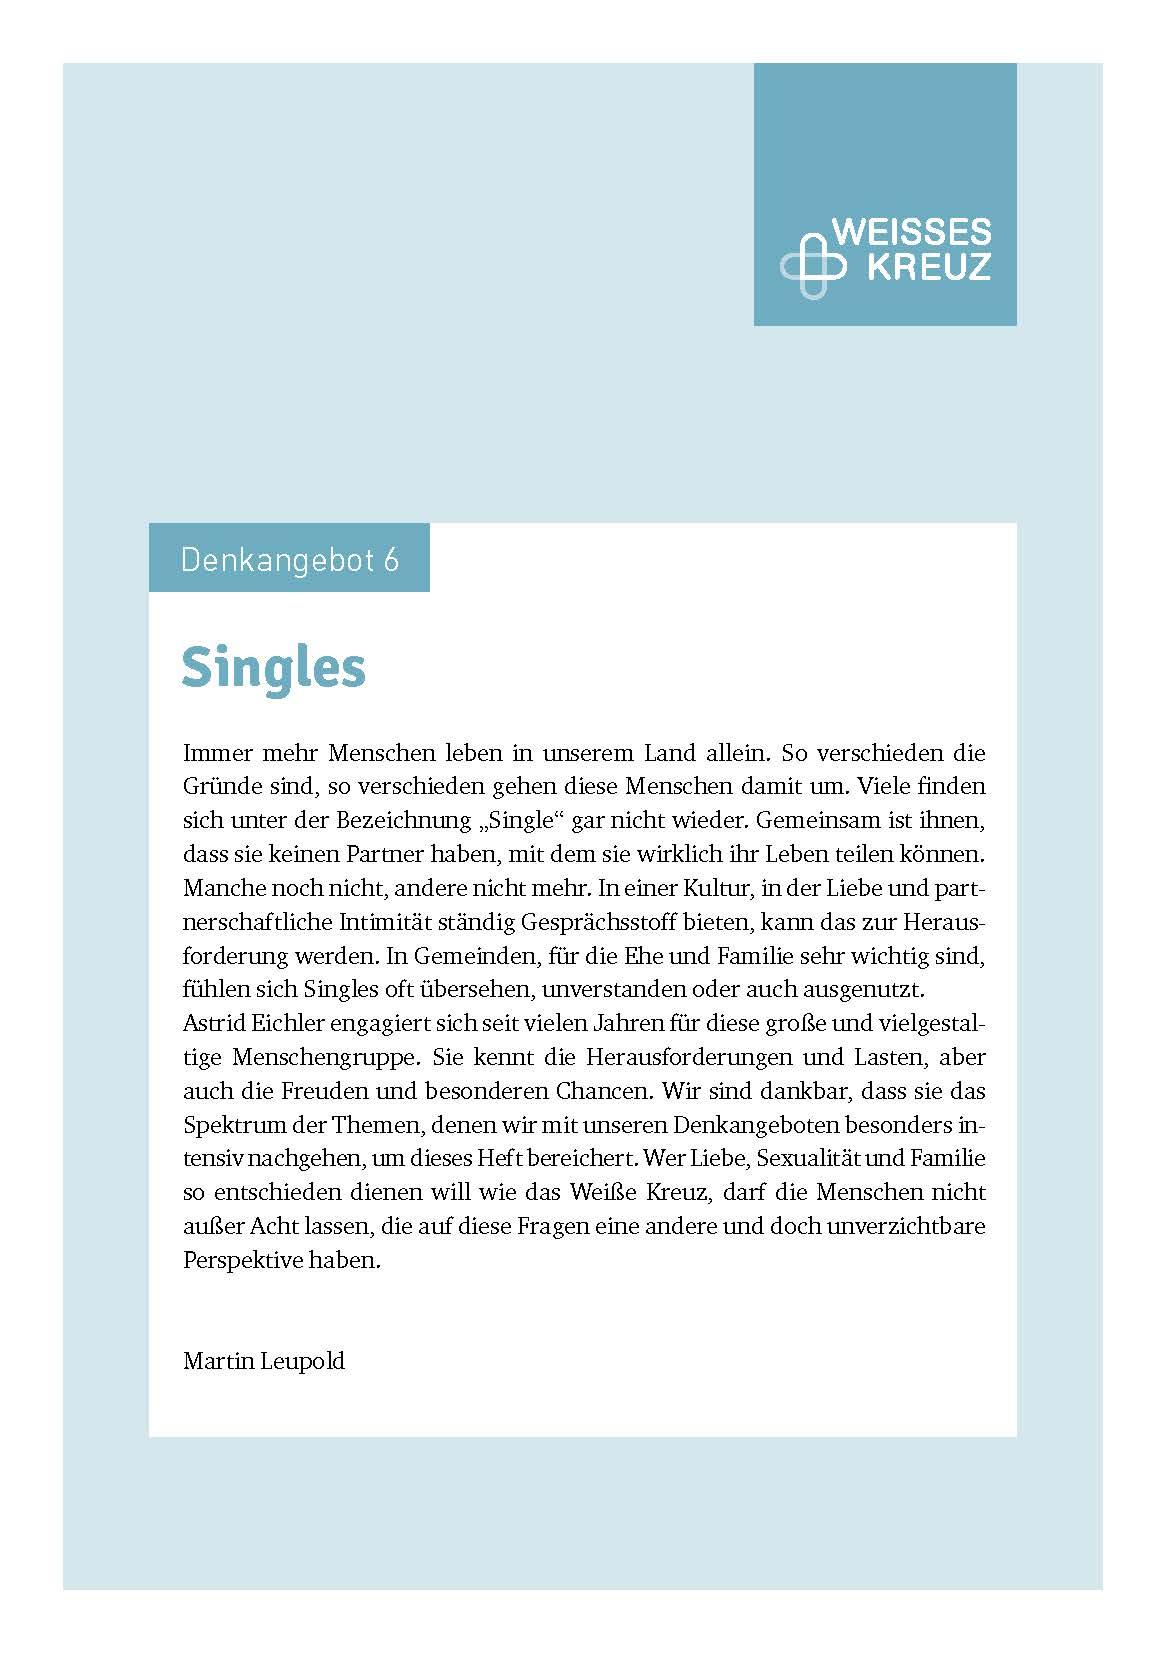 Denkangebot Nr. 6 - Singles